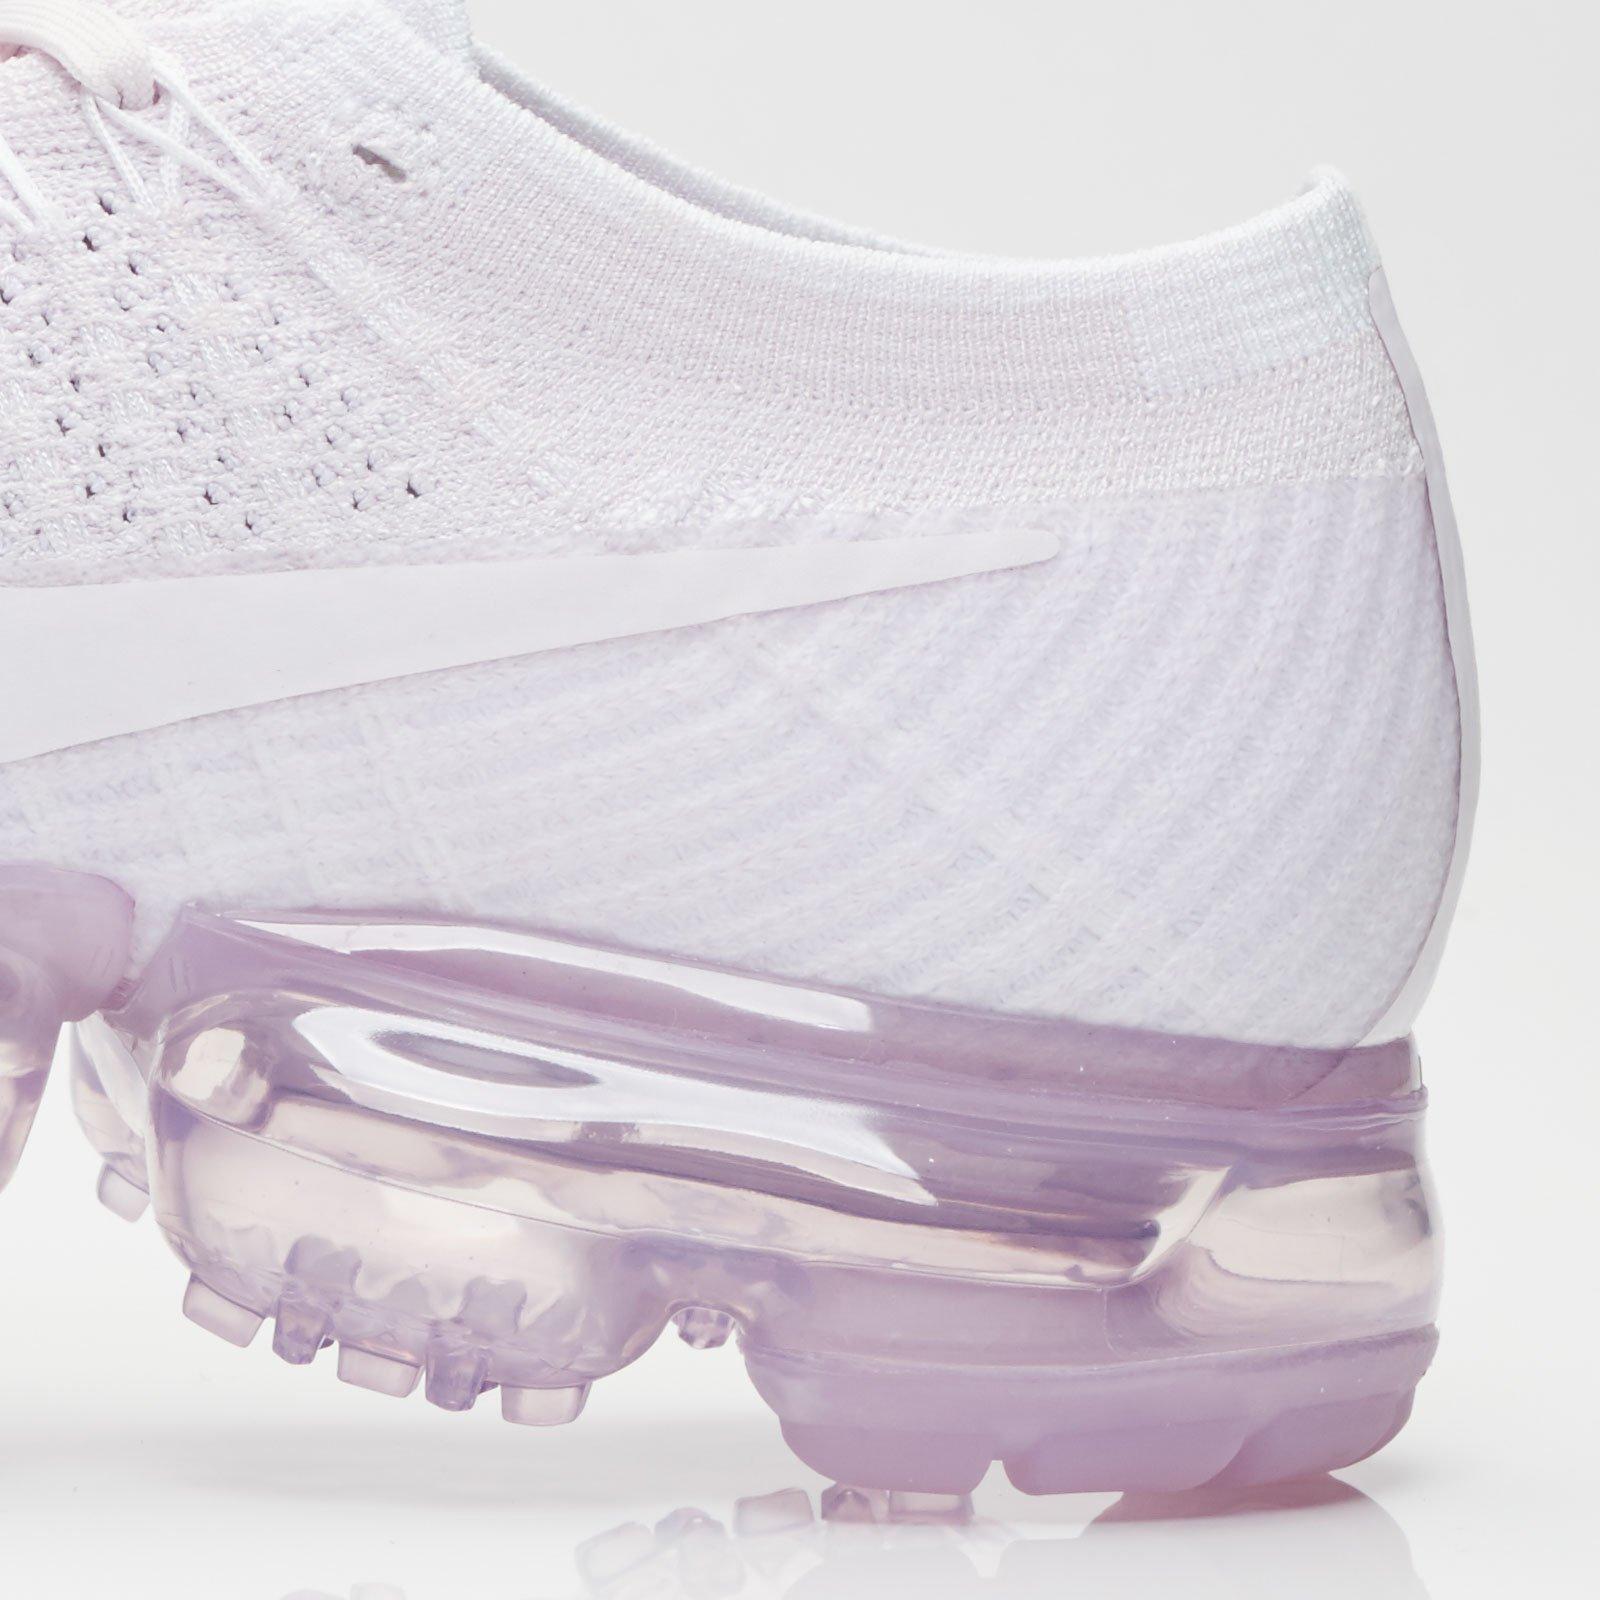 pretty nice 1e7ae 99838 Nike Wmns Air Vapormax Flyknit - 849557-501 - Sneakersnstuff ...